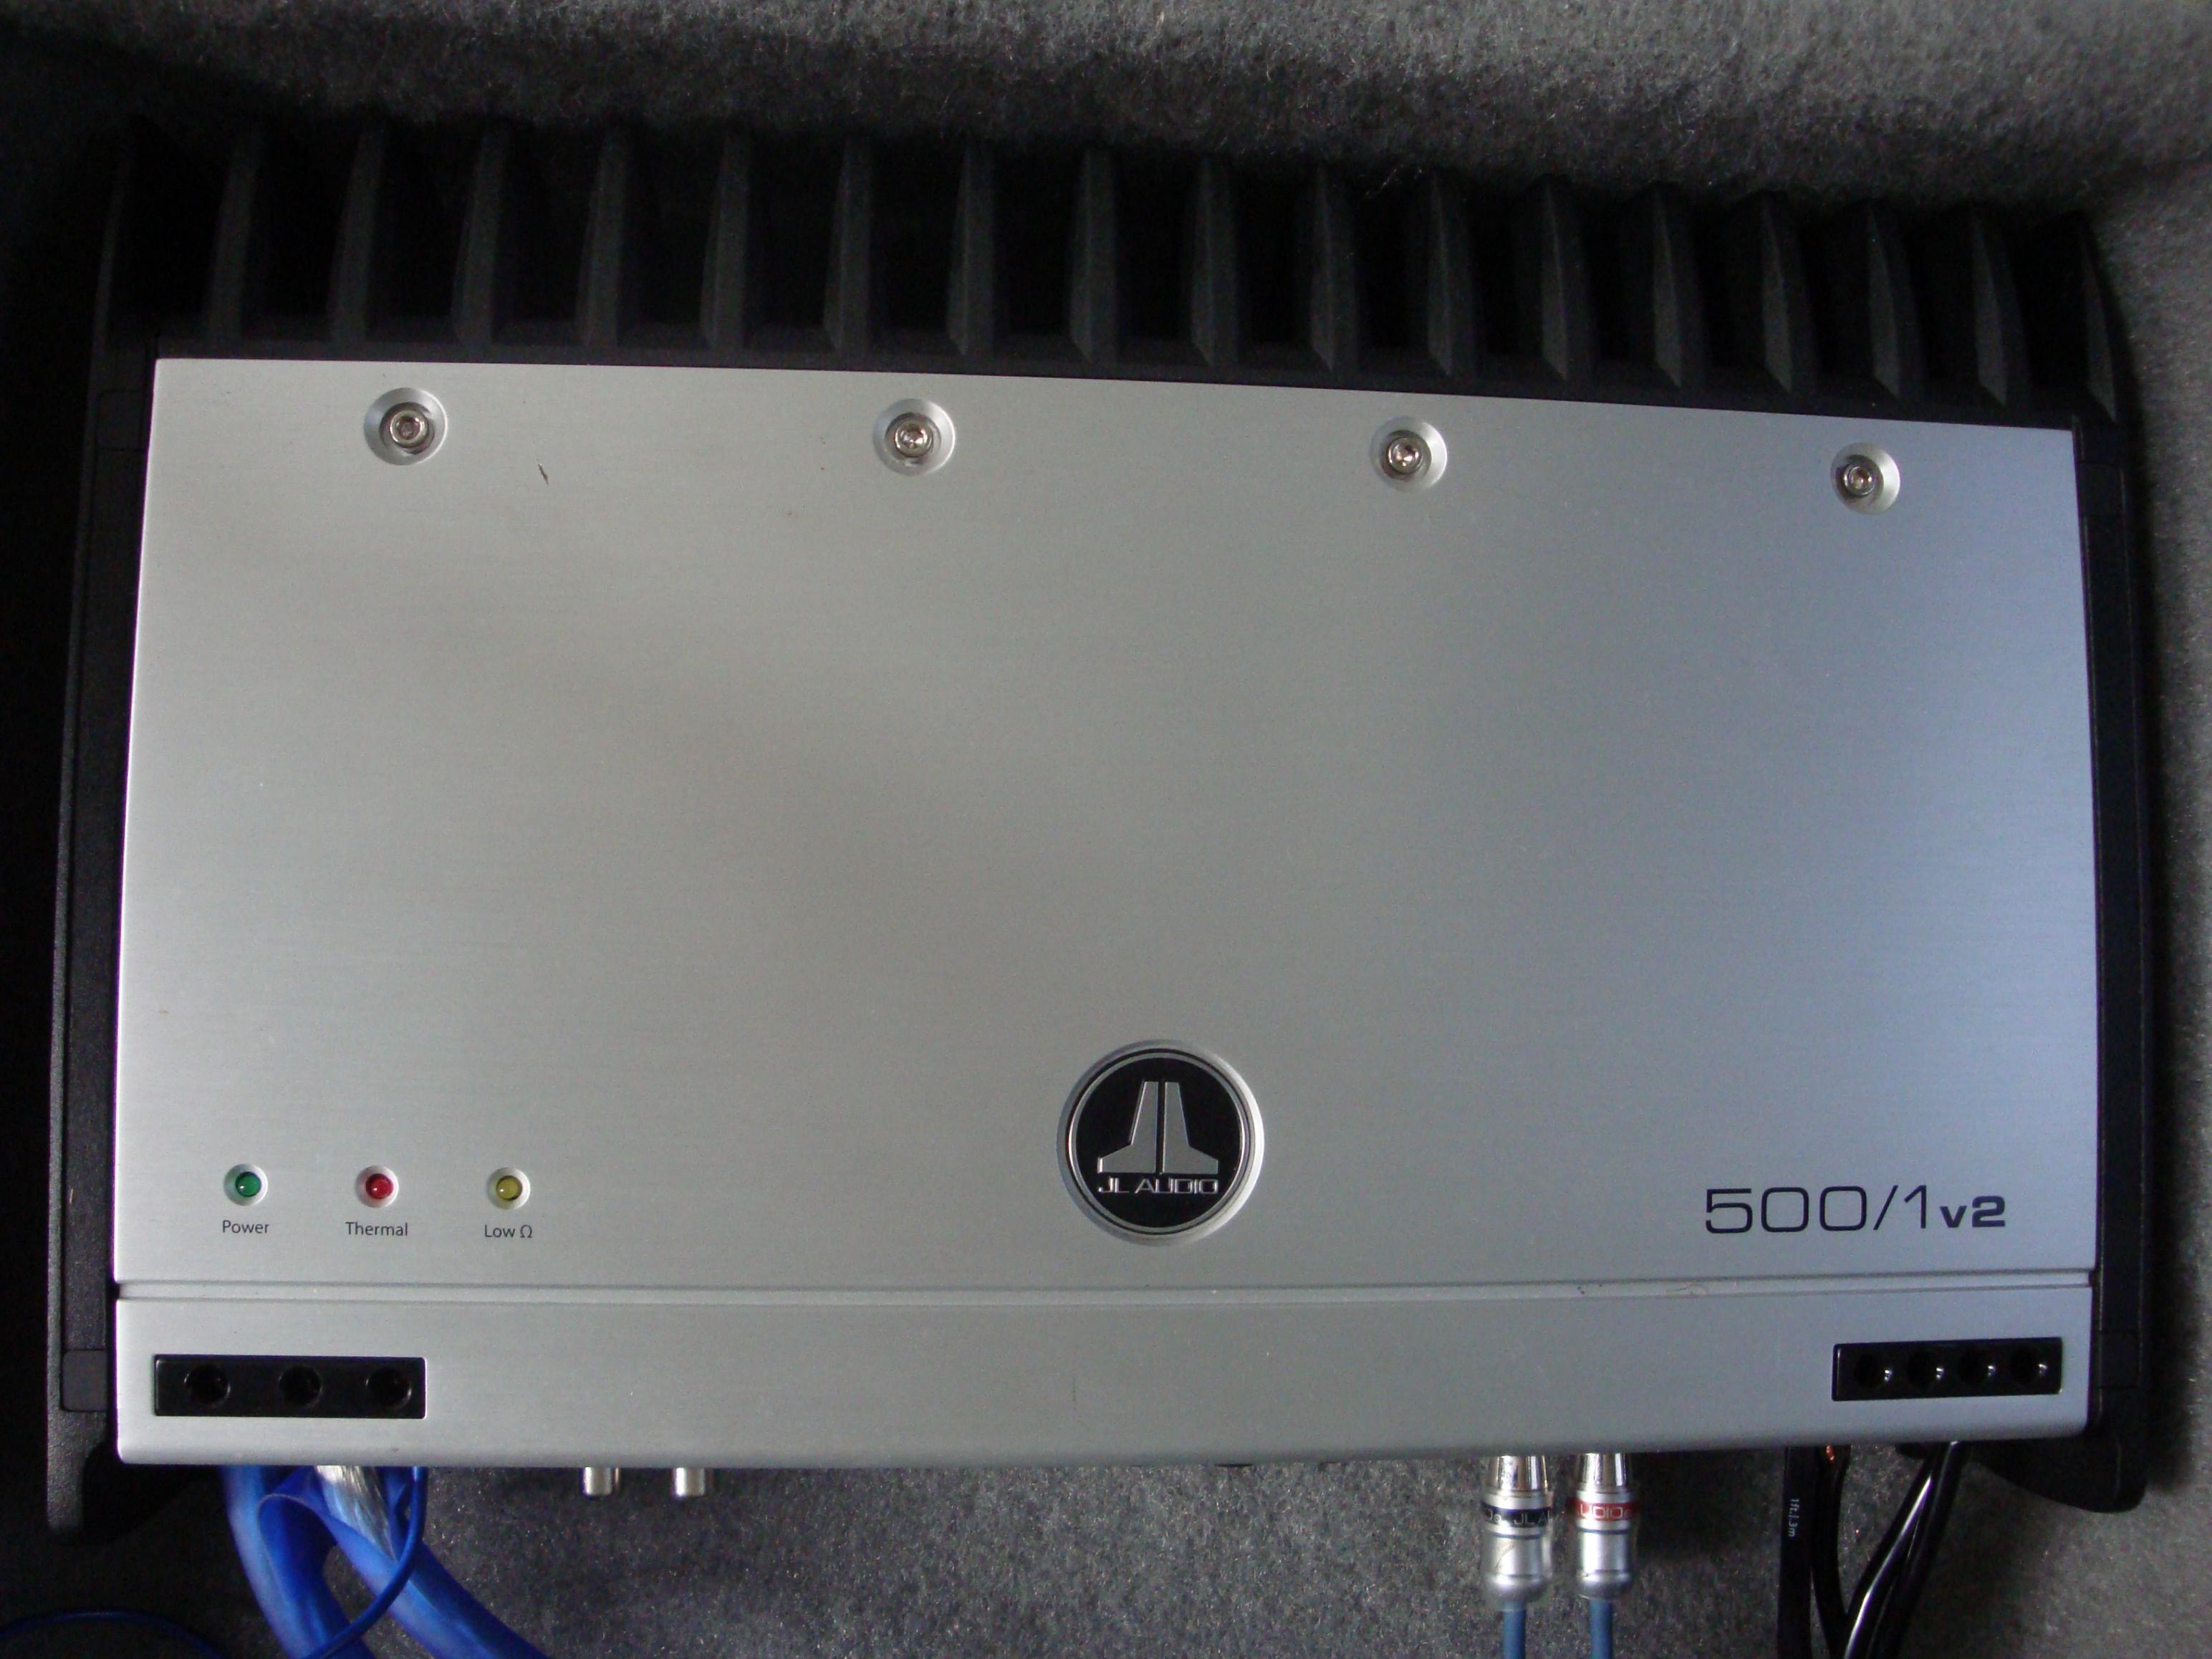 Nissan Titan Forum View Single Post F S Jl Audio500 110w3 Wiring Diagram For Subs Audio 500 1 110w3tech12volt Box 003